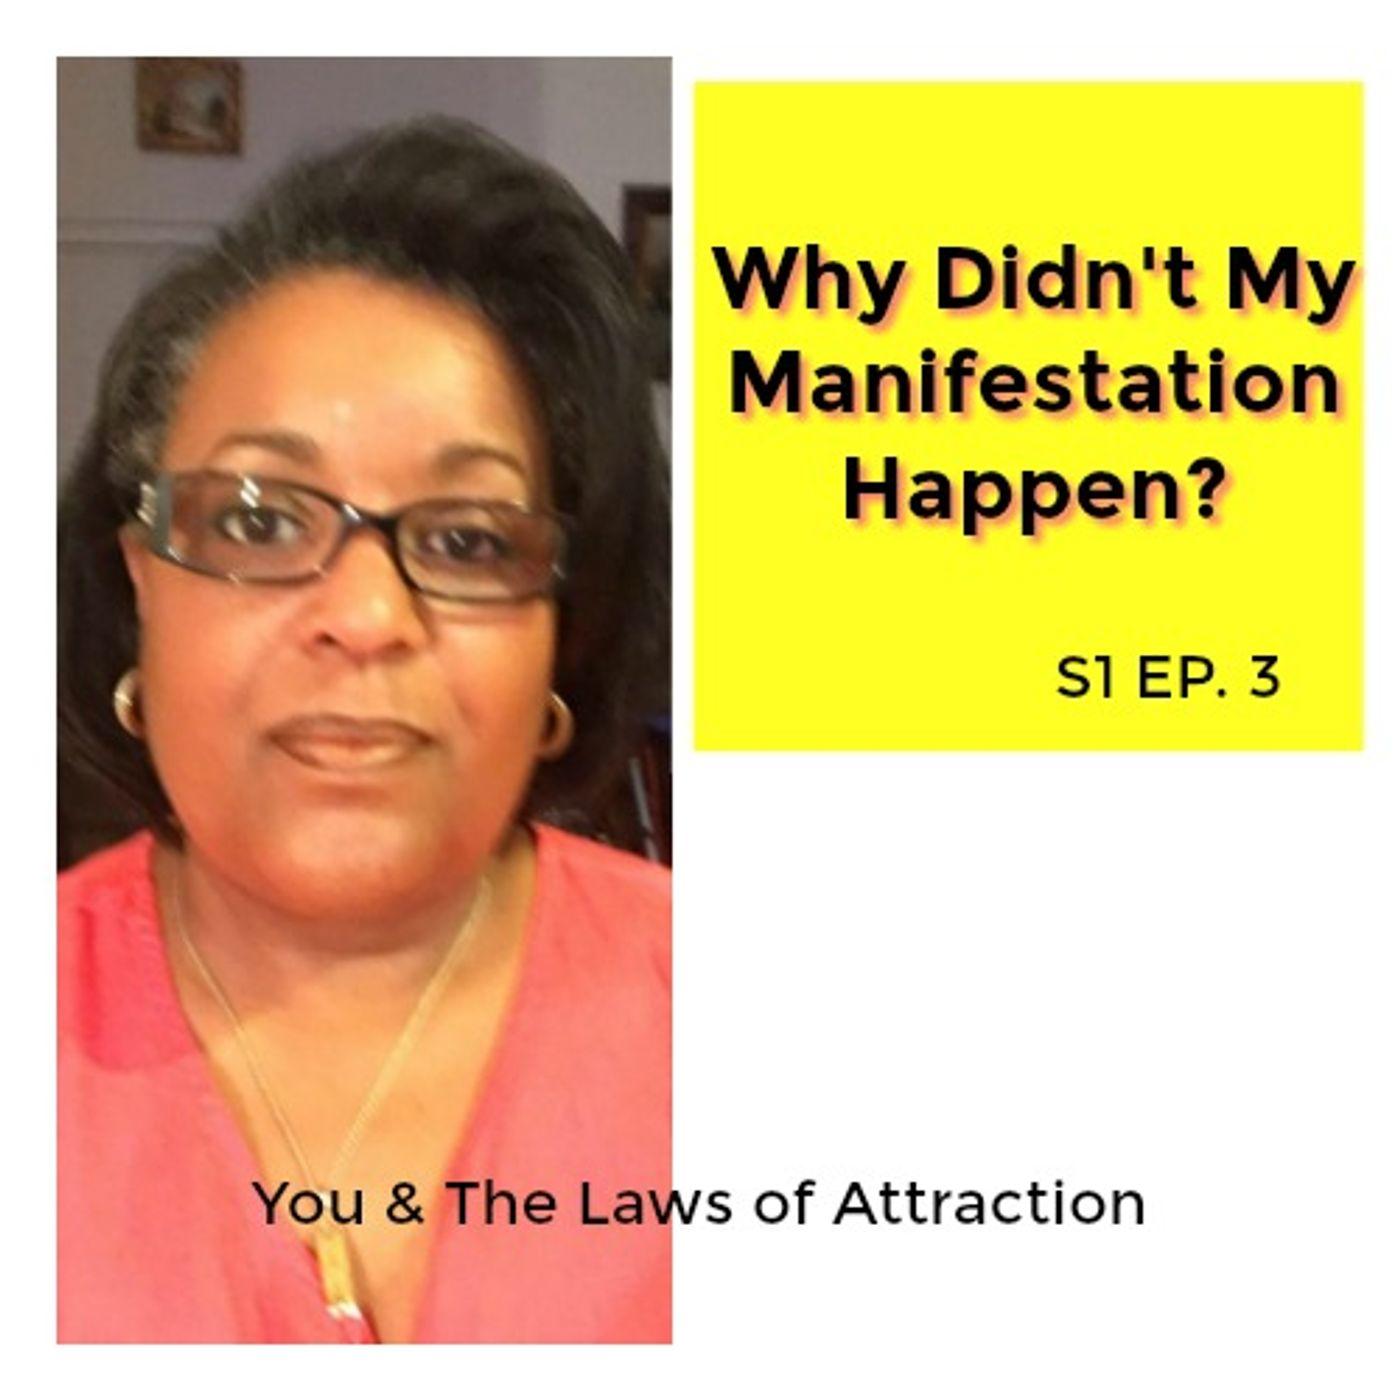 Why Didn't My Manifestation Happen?